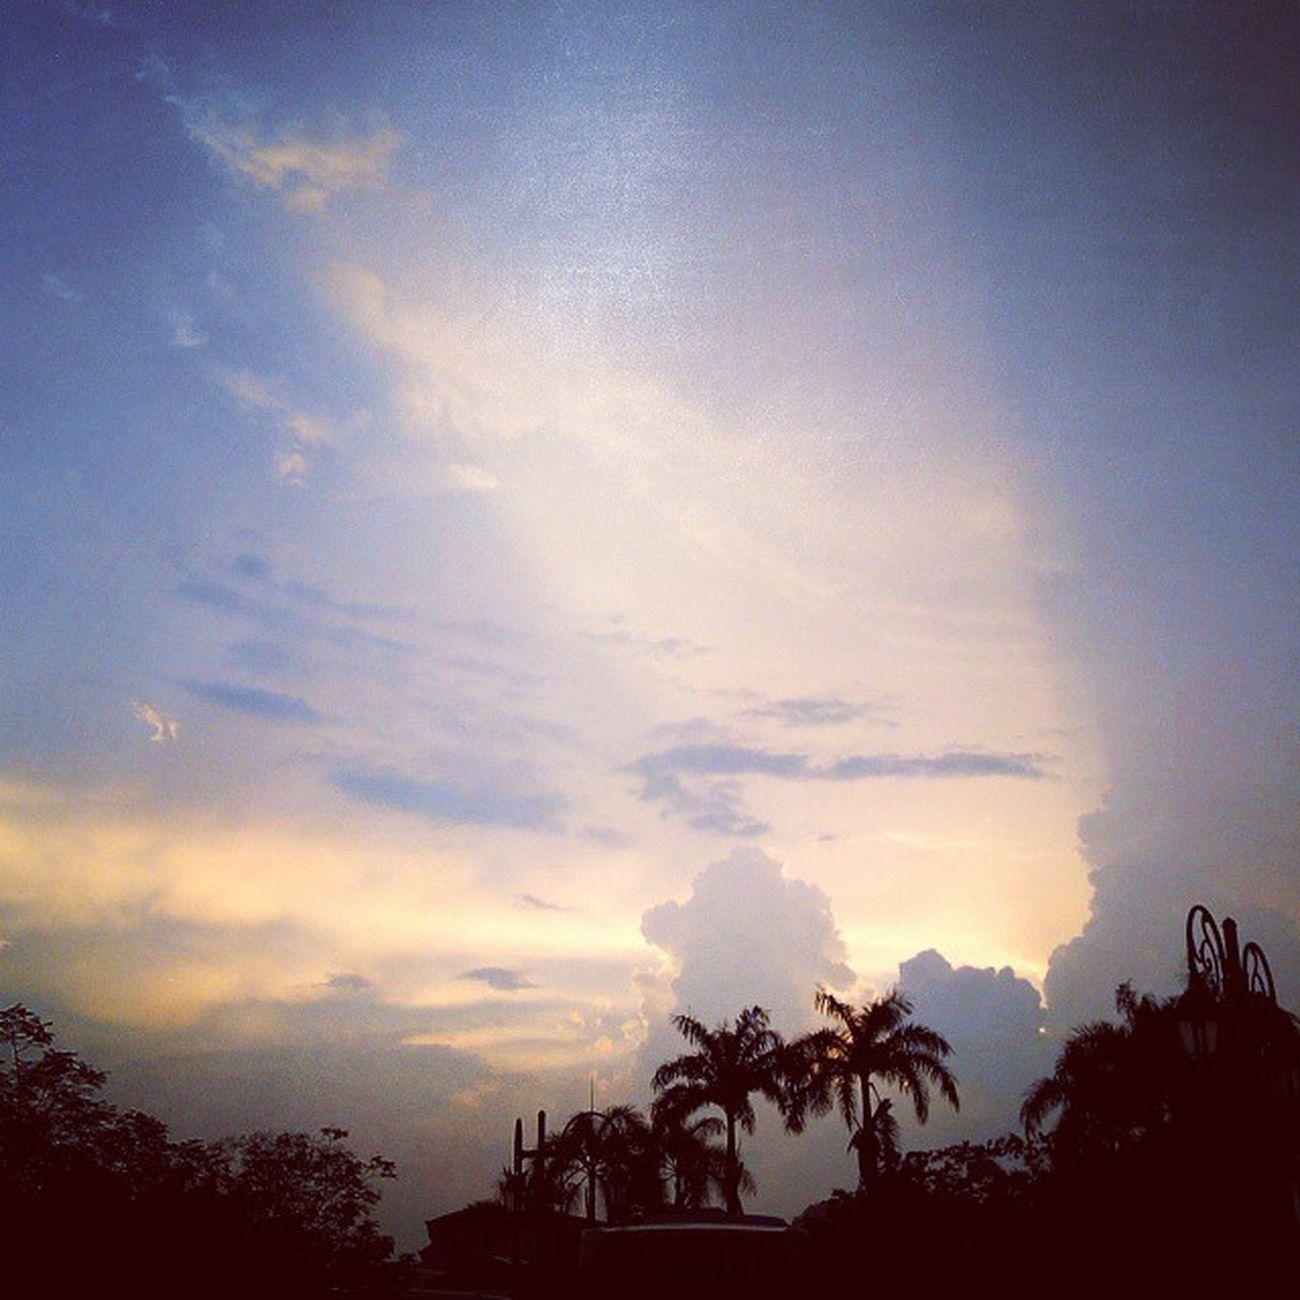 Cloudysky Nature Outdoor Malaysia Tanjungmalim Upsi Silhouette Sunset Perak